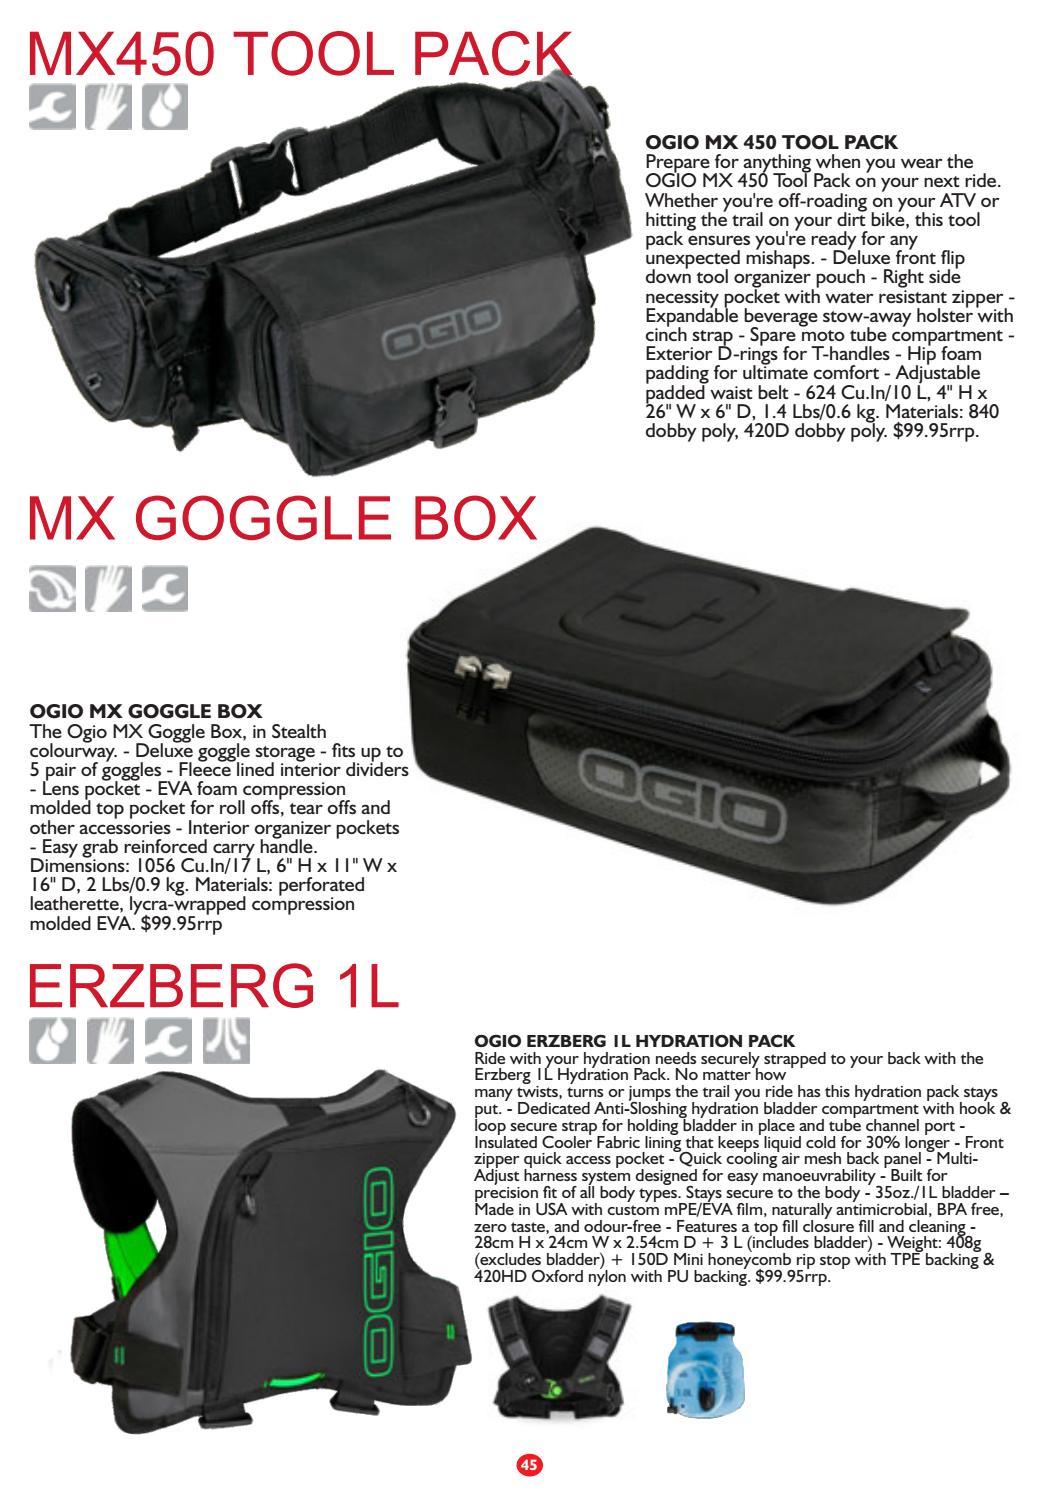 Stealth Ogio MX Goggle Box Outdoor Moto Bag